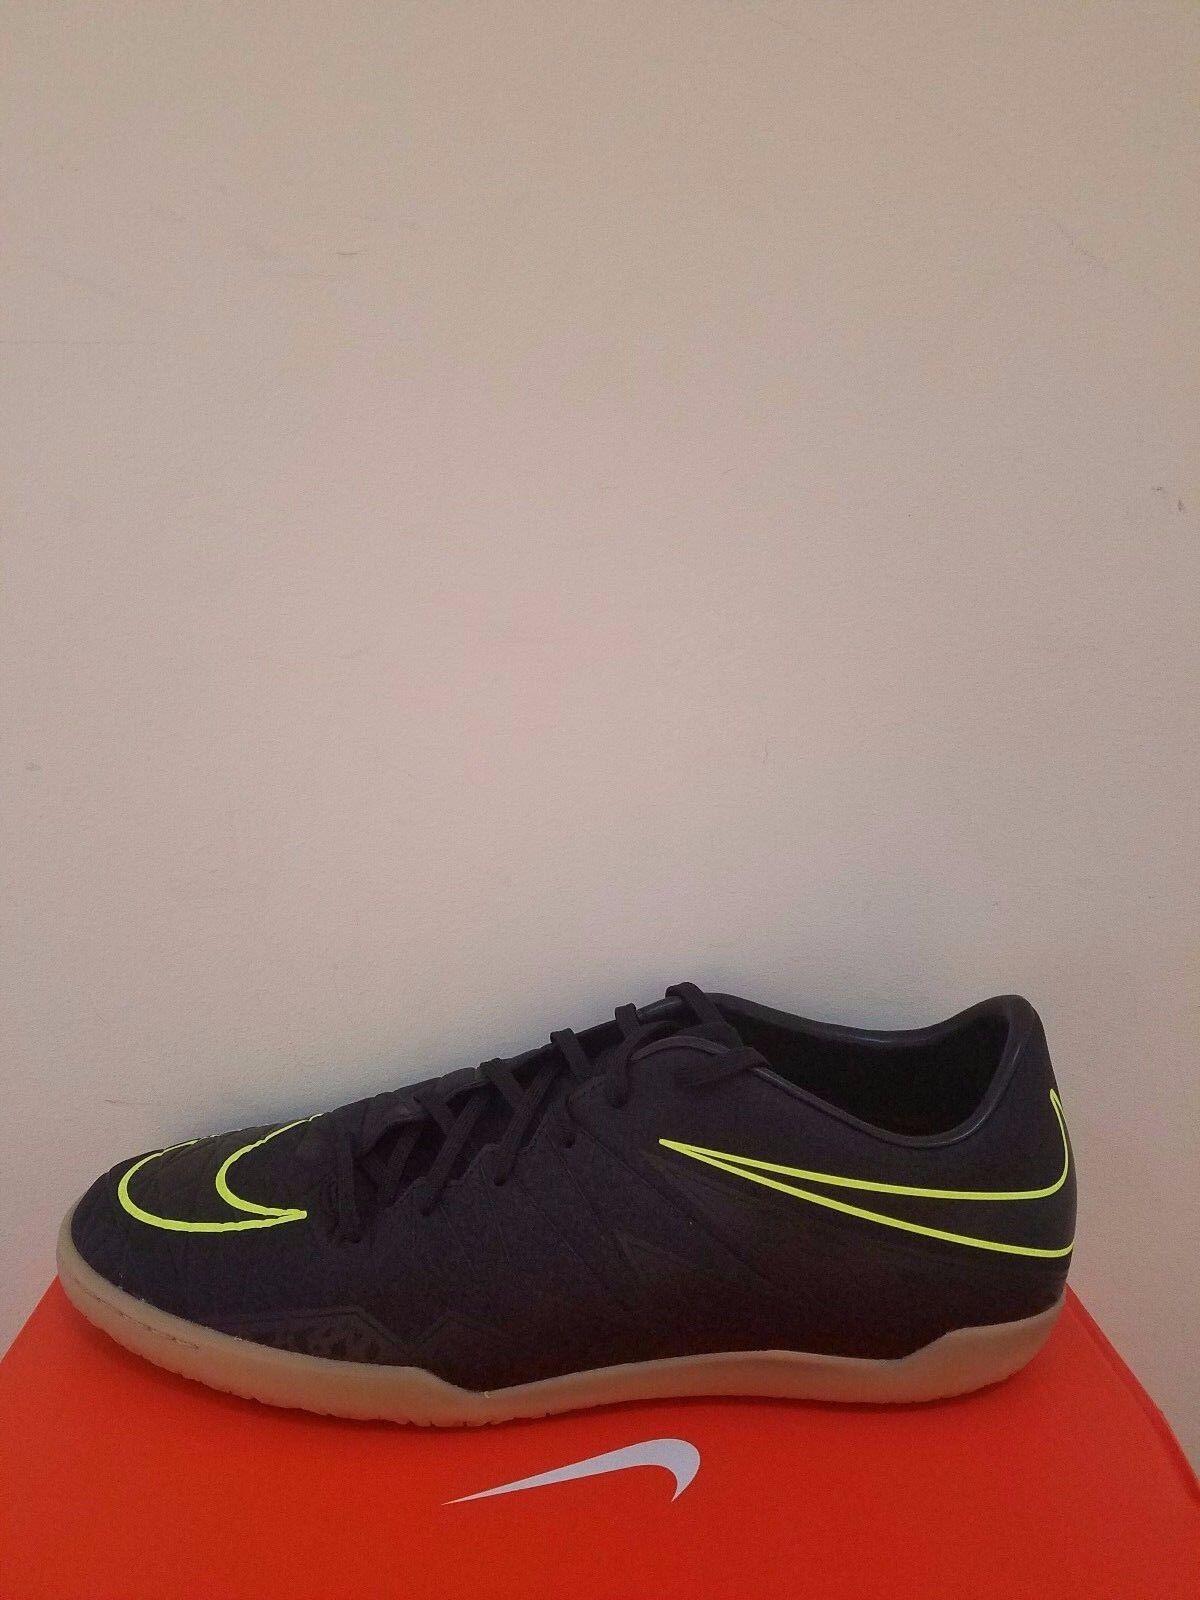 Nike Men's HyperVenom Phelon II Price reduction Mens Soccer Shoe Comfortable